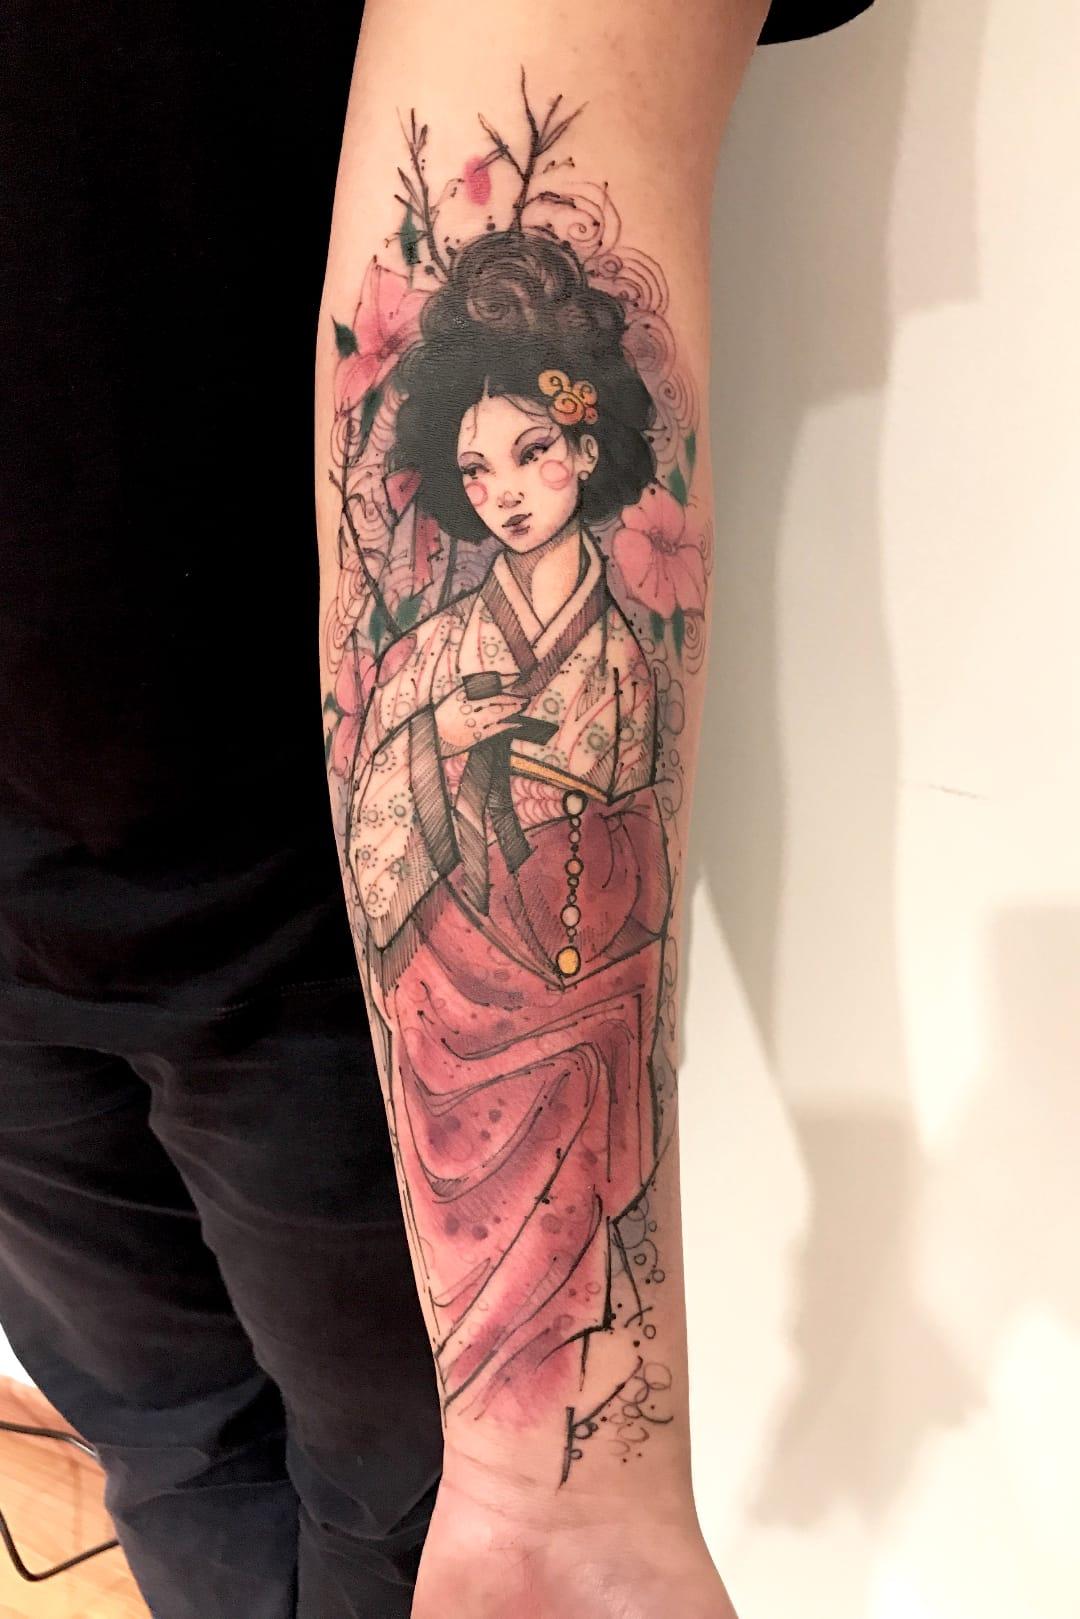 Gueixa #LincolnLima #brazilianartist #brasil #brazil #tatuadoresdobrasil #sketchstyle #watercolor #aquarela #gueixa #geisha #woman #mulher #girl #garota #japonese #japonesa #oriental #flor #flower